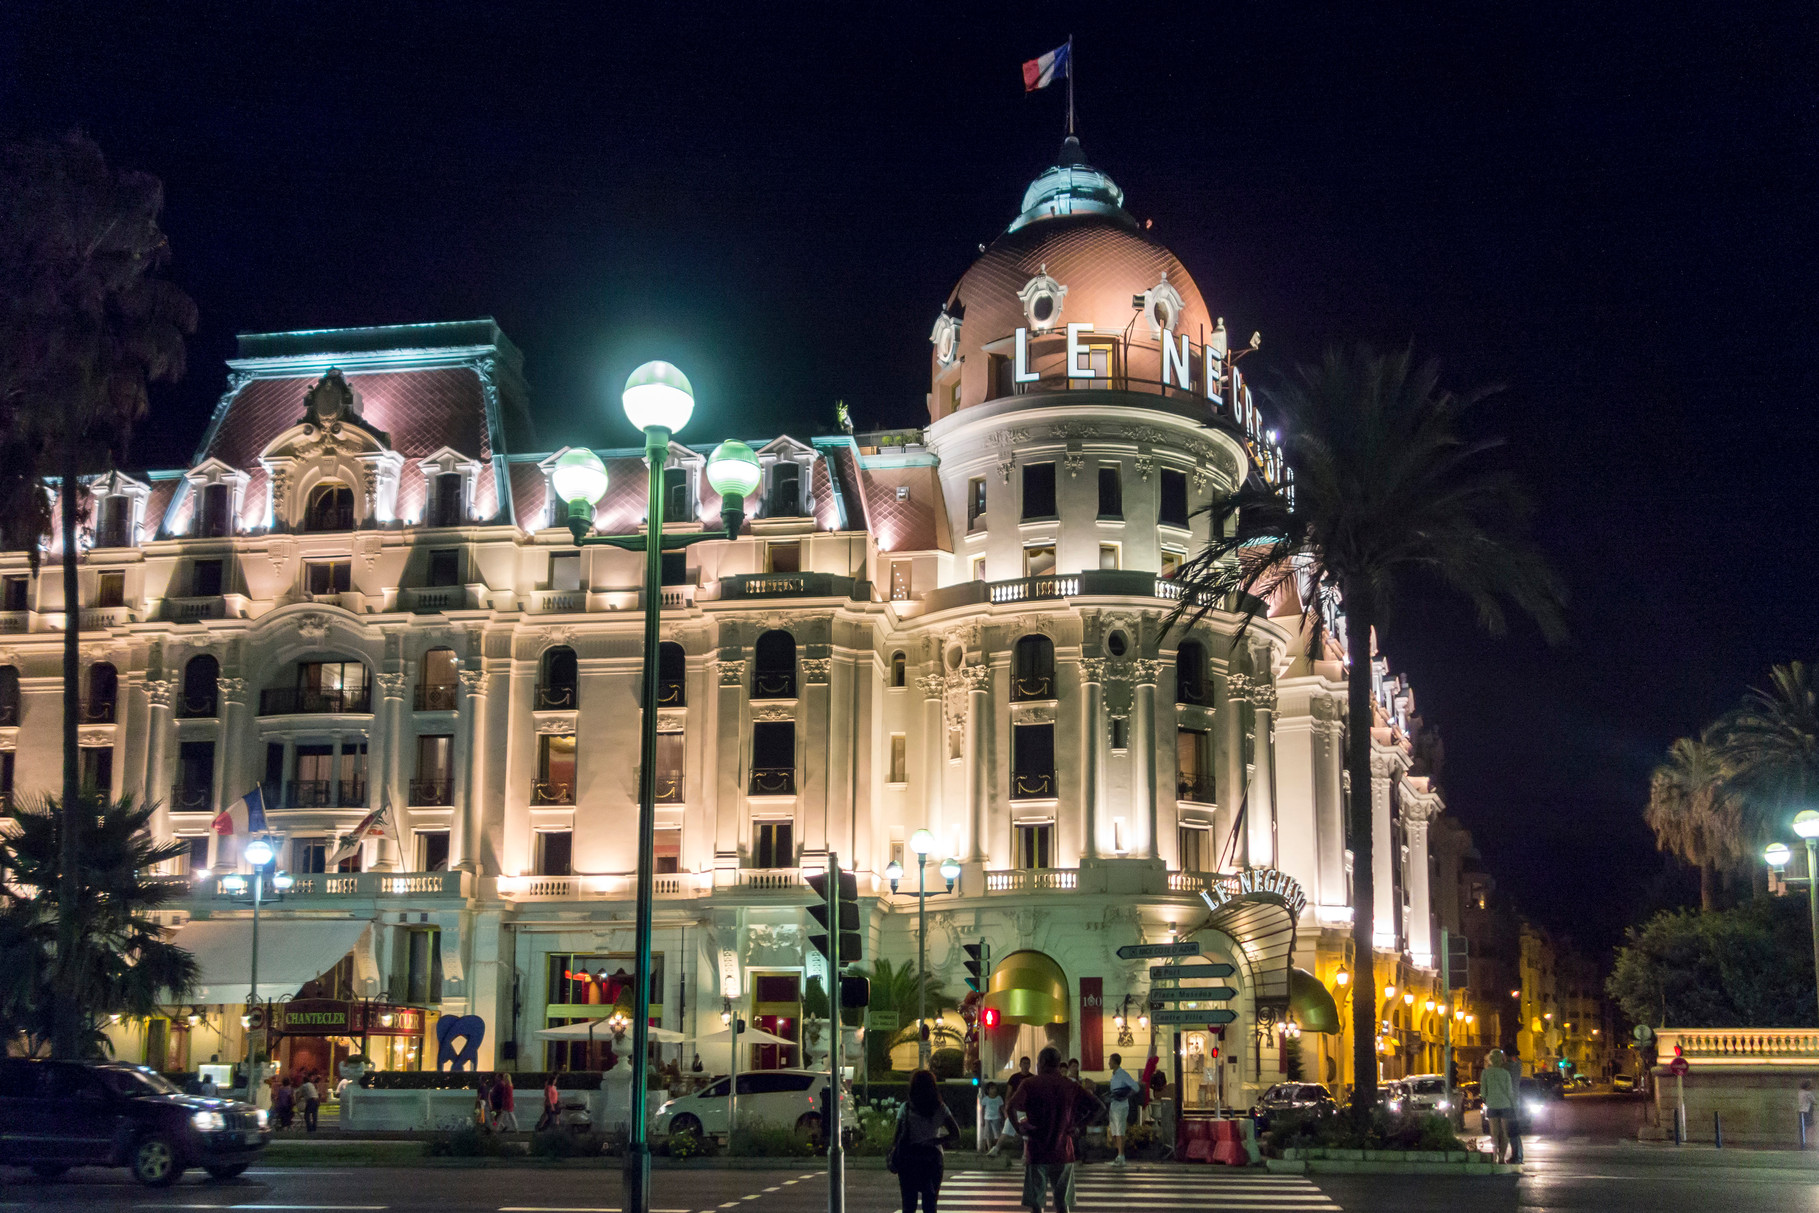 Hotel Negresco an der Promenade des Anglais (Strandpromenade von Nizza)